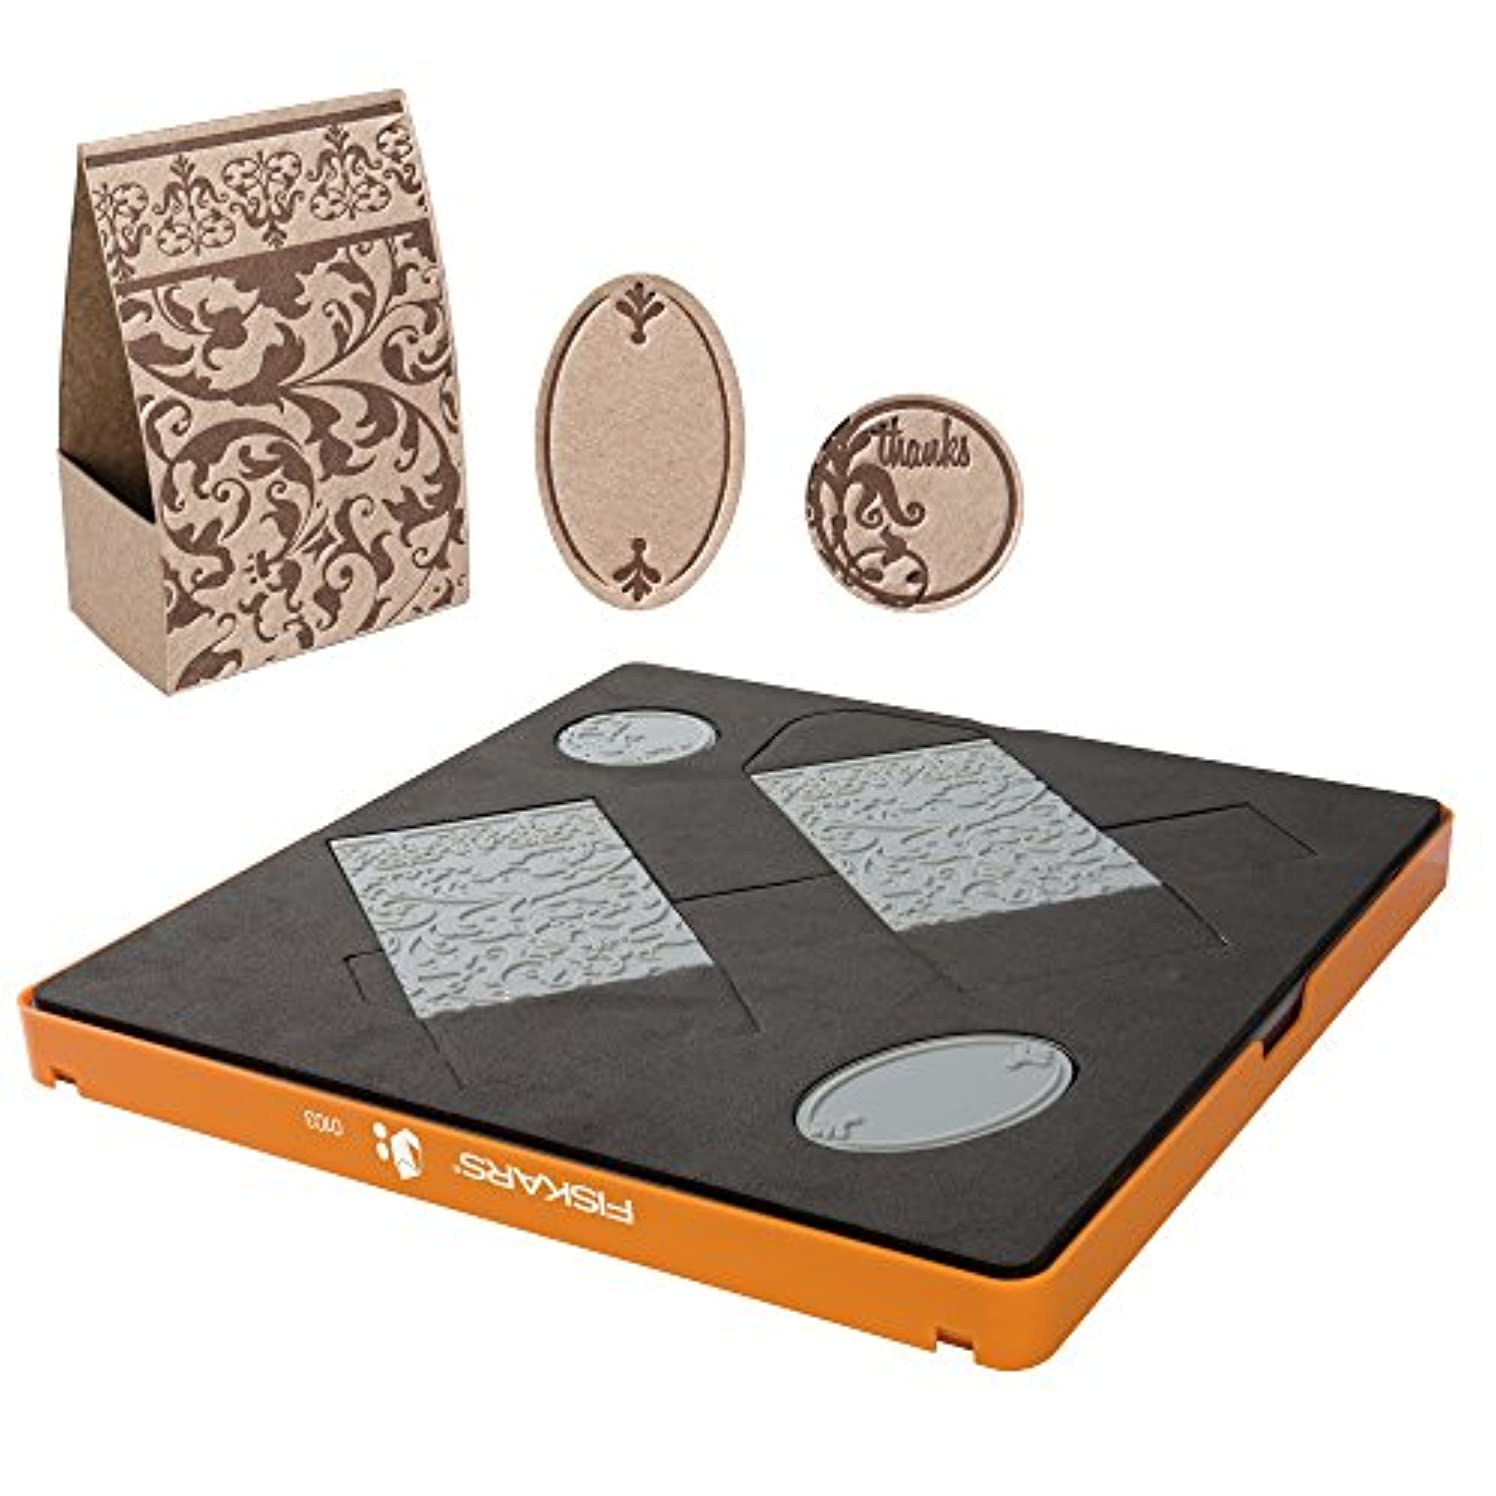 Fiskars Fuse Large Thick Material Favour Wrap Design Set, Grey